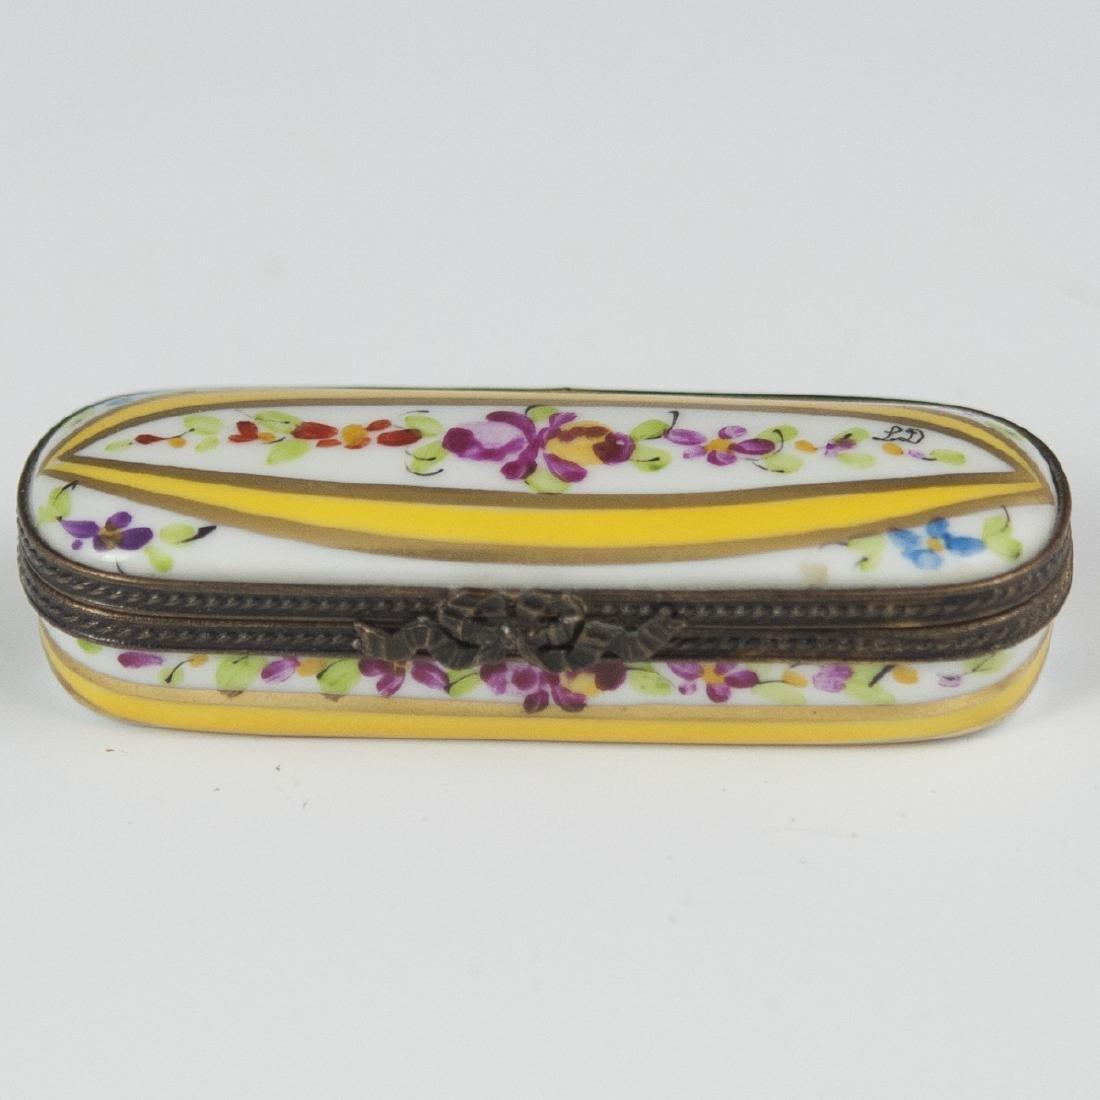 Limoges Porcelain Needle Box